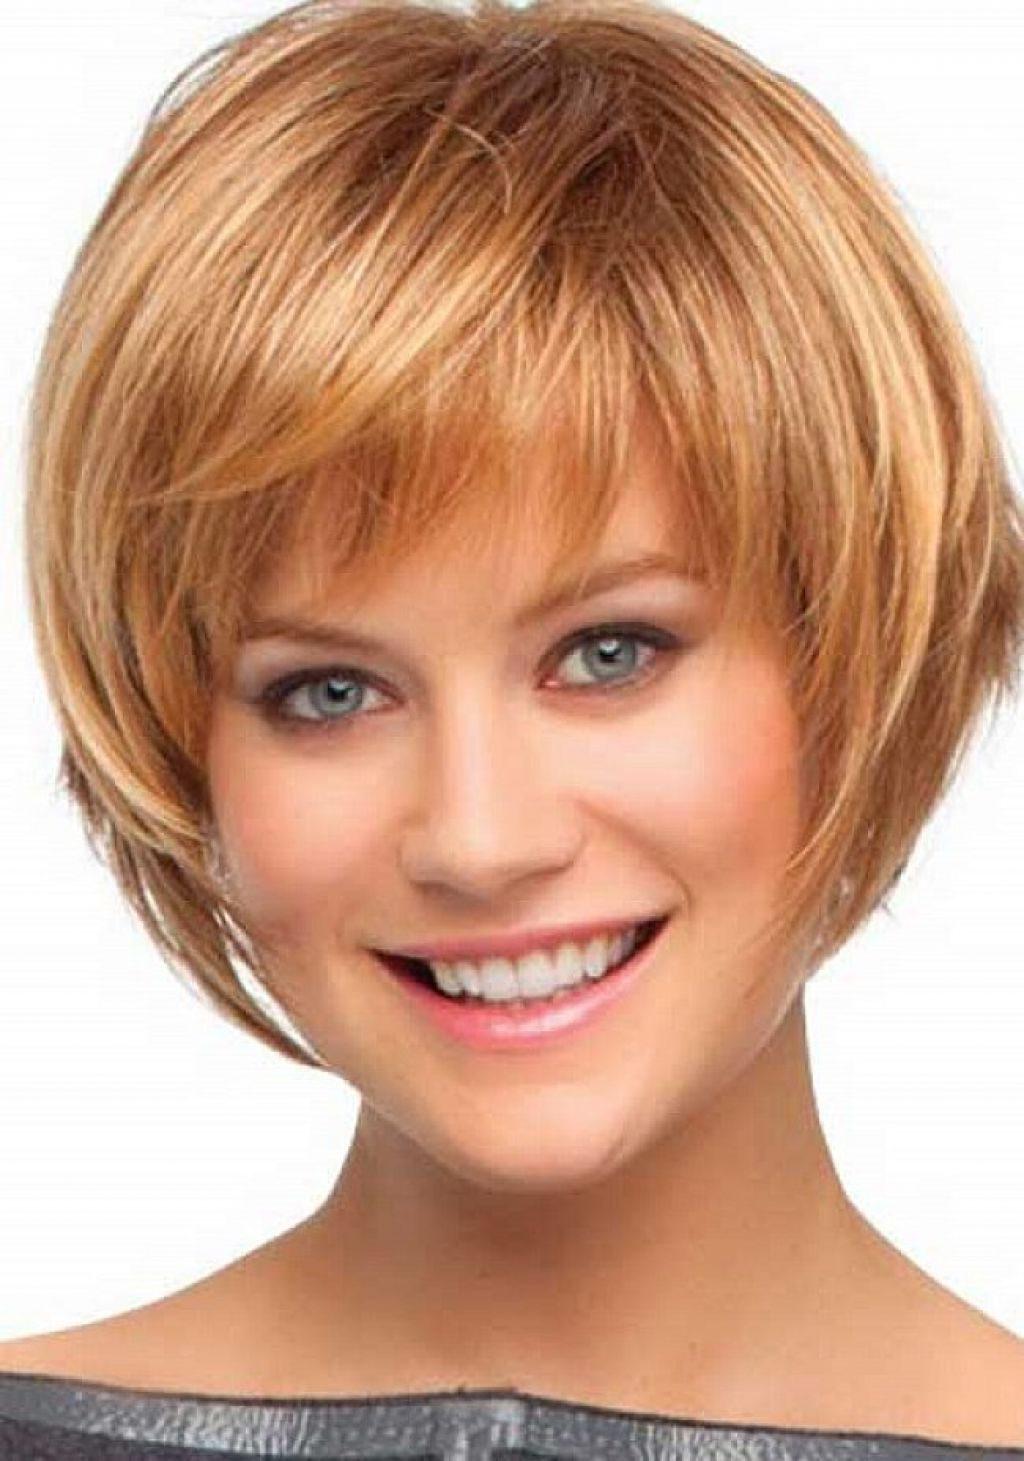 Прическа боб на коротких волосах фото